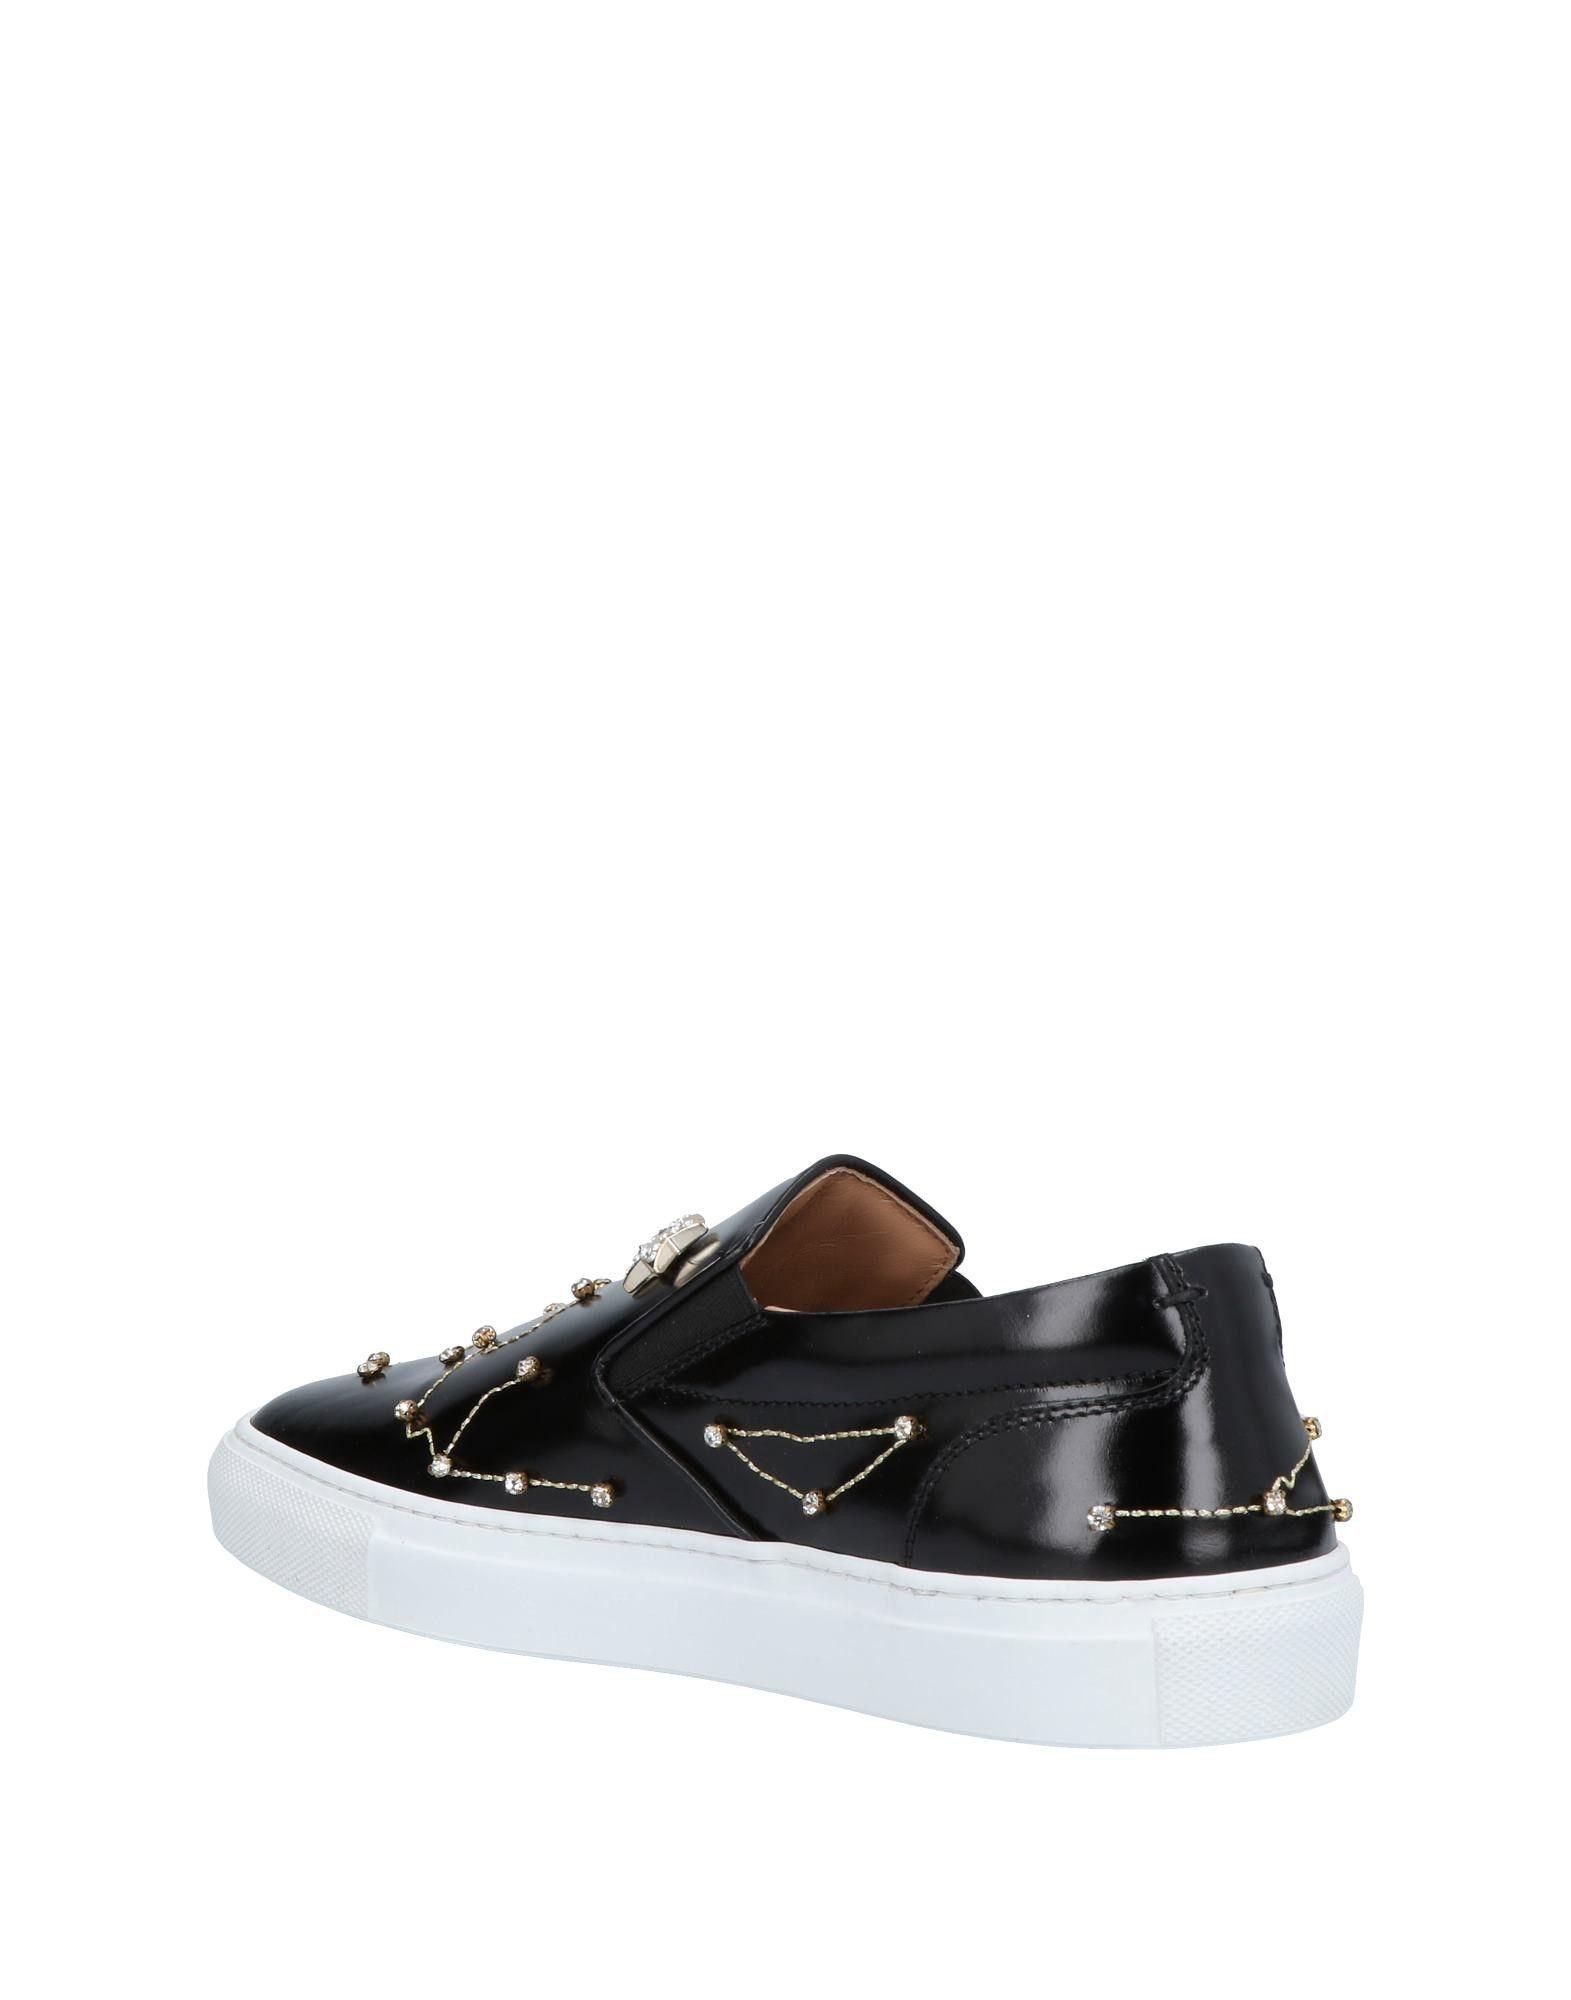 Stilvolle billige Sneakers Schuhe Coliac Martina Grasselli Sneakers billige Damen  11426161RJ 6d4010